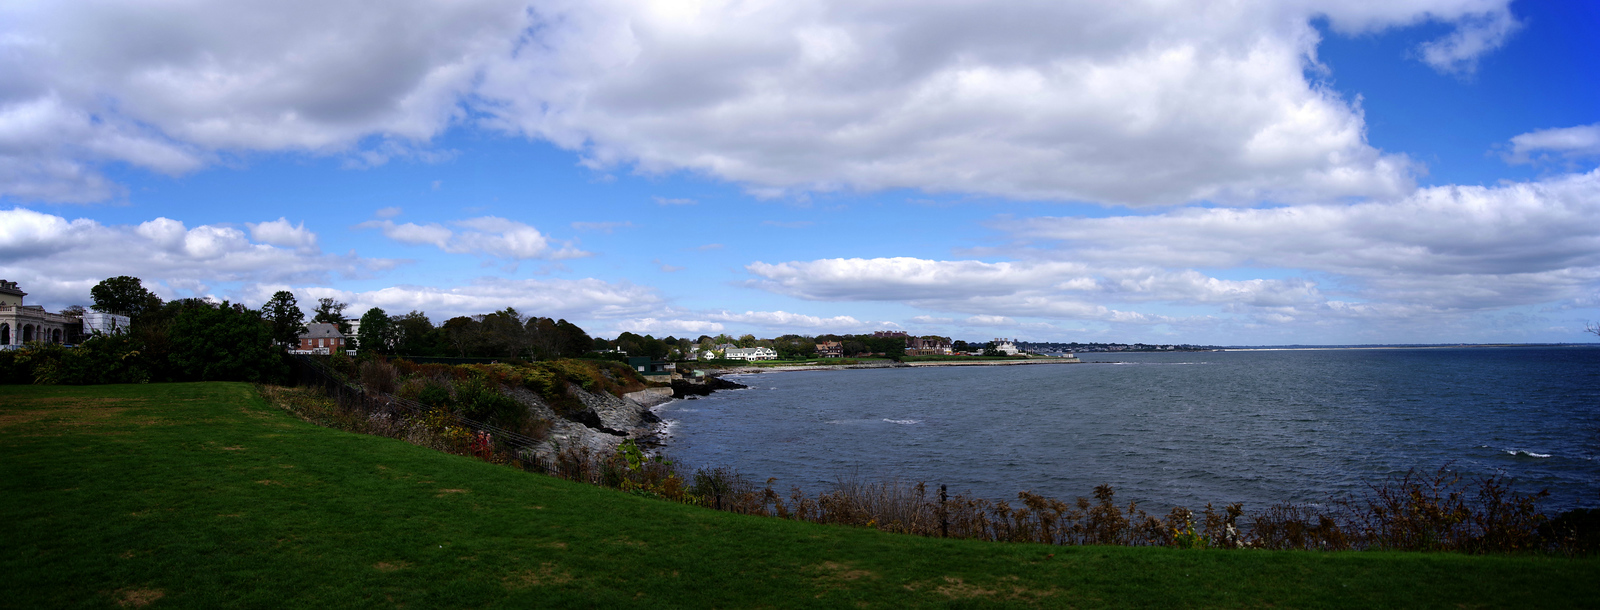 Newport -  Landscape